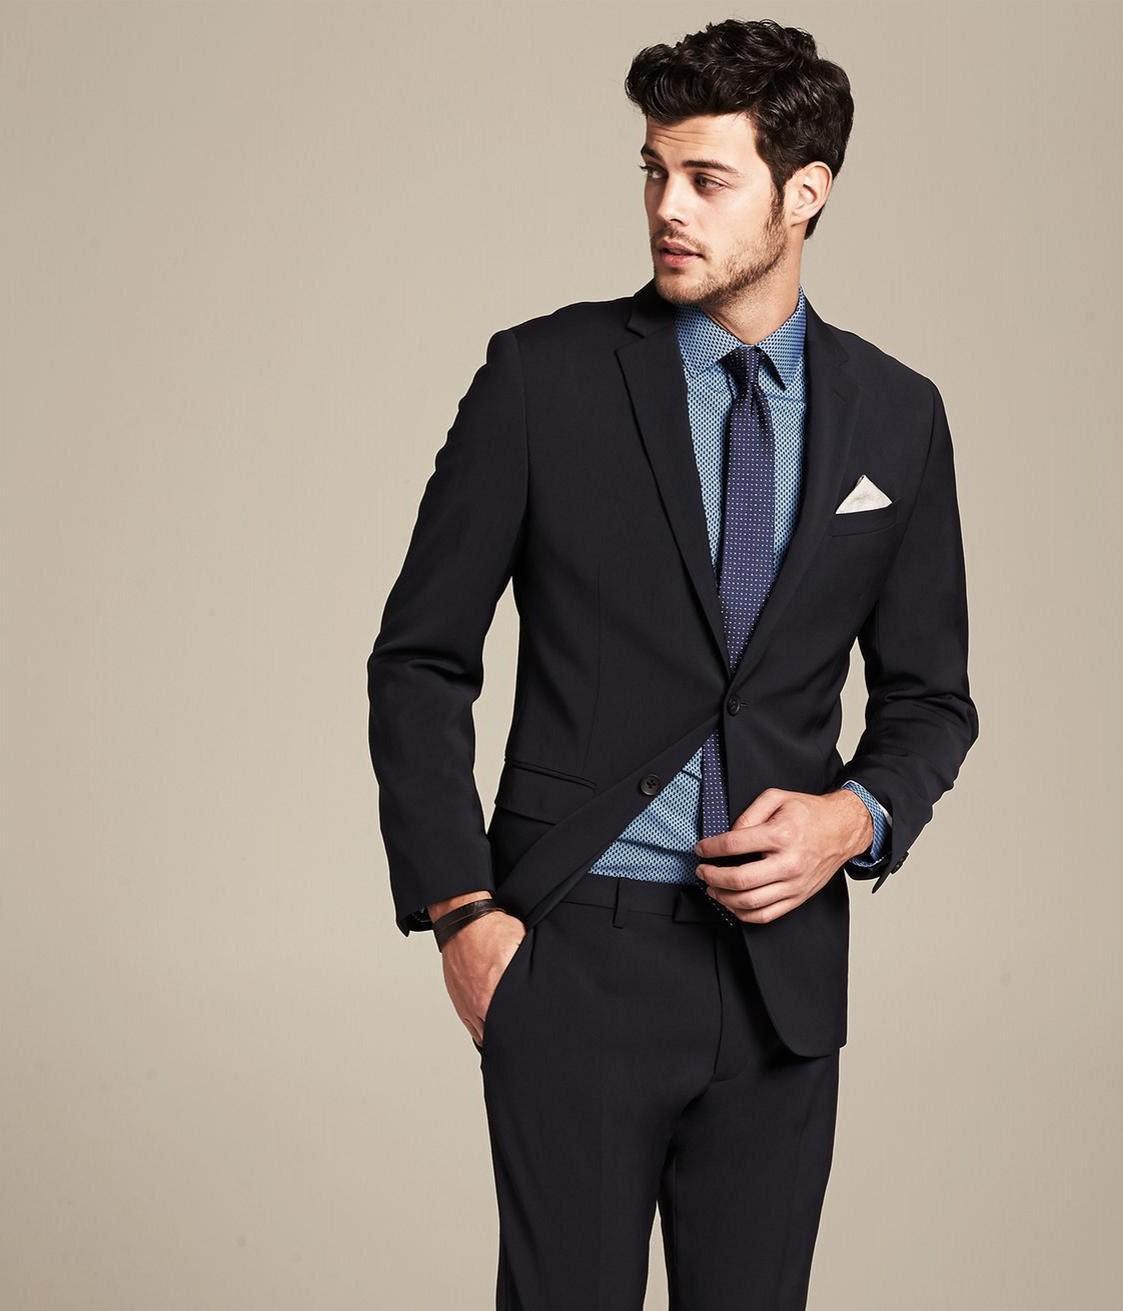 2015 new arrival suit black man pants formal wear for men